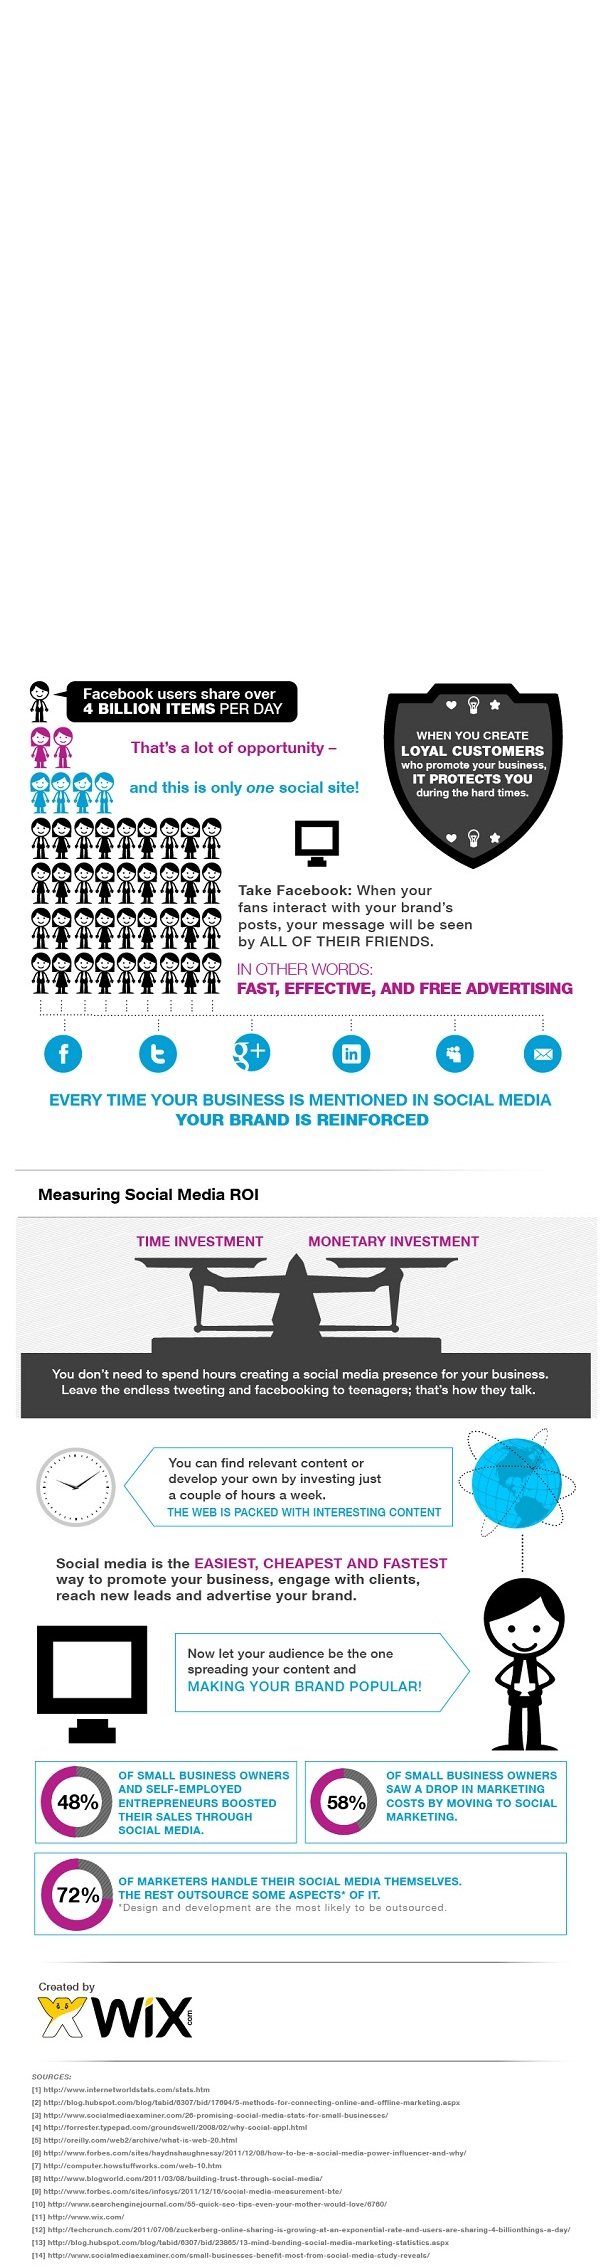 wix social media 1